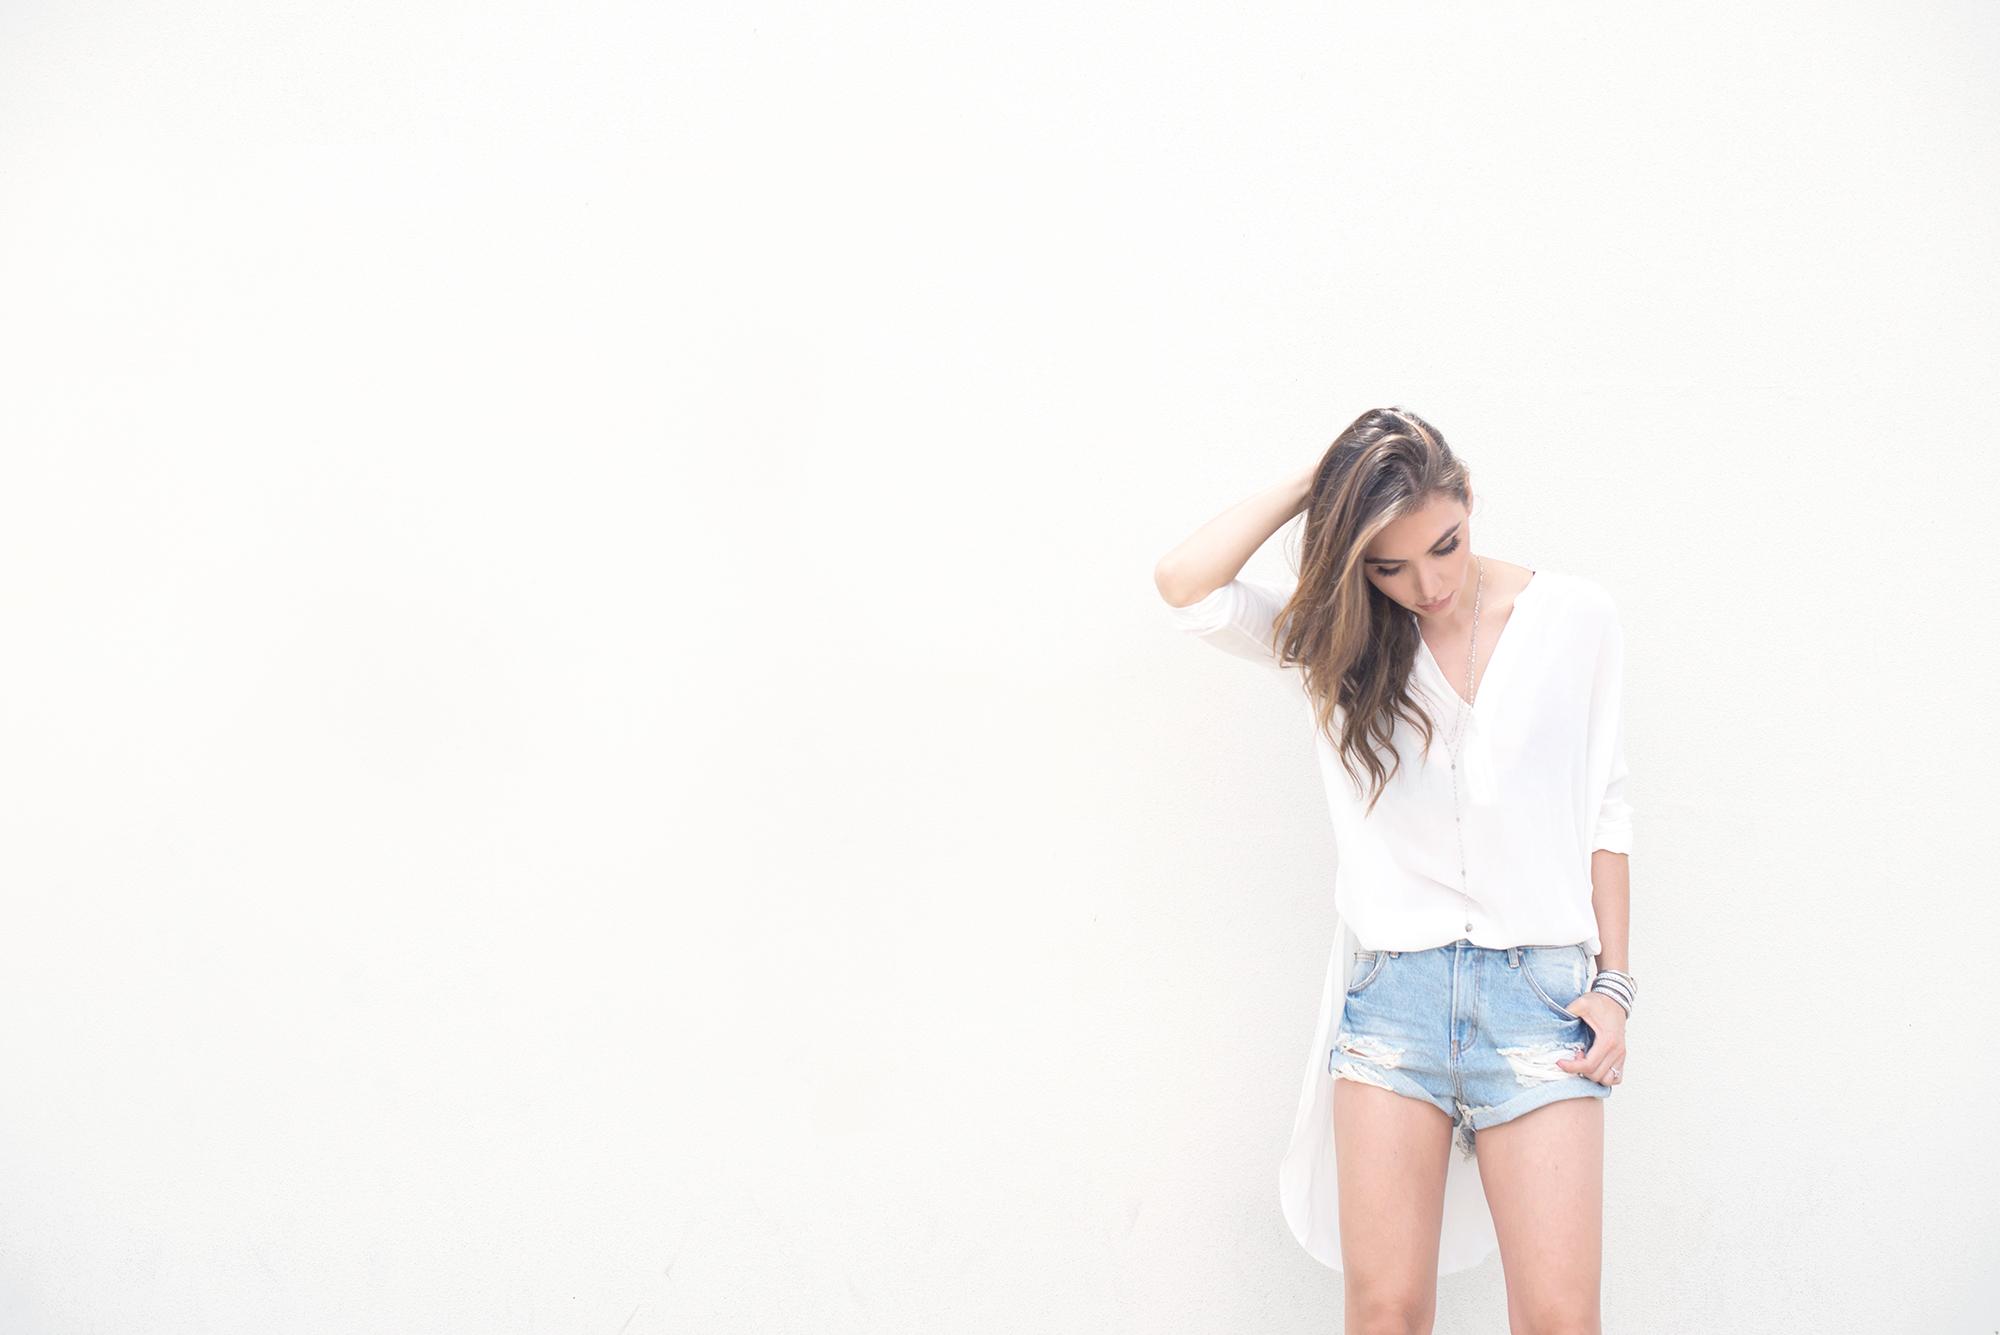 White blouse and denim shorts